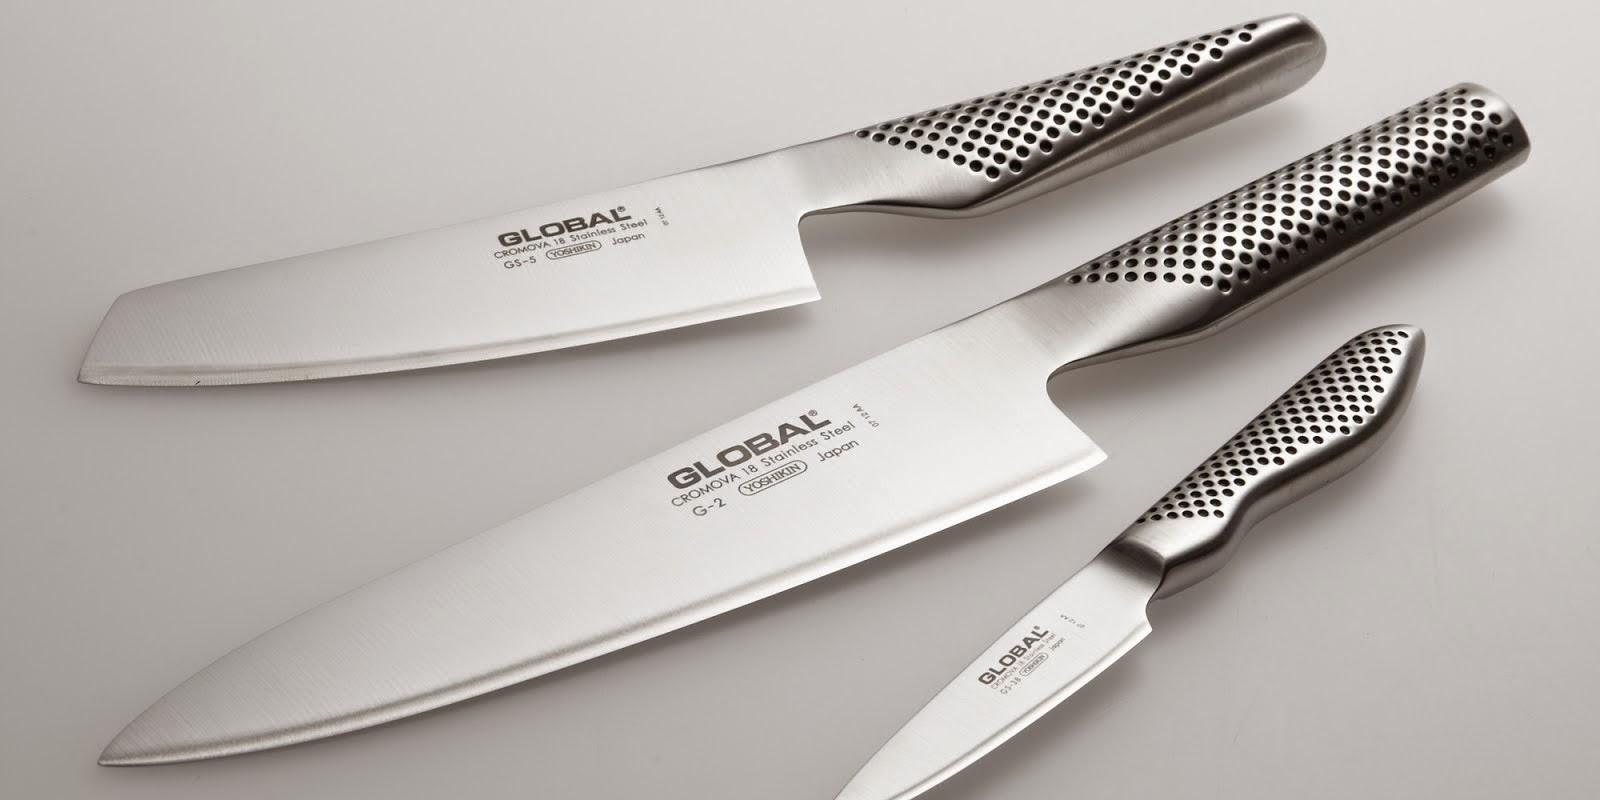 Knivslipning | Slipa knivar | Slipa kniv | Slipning av knivar ...